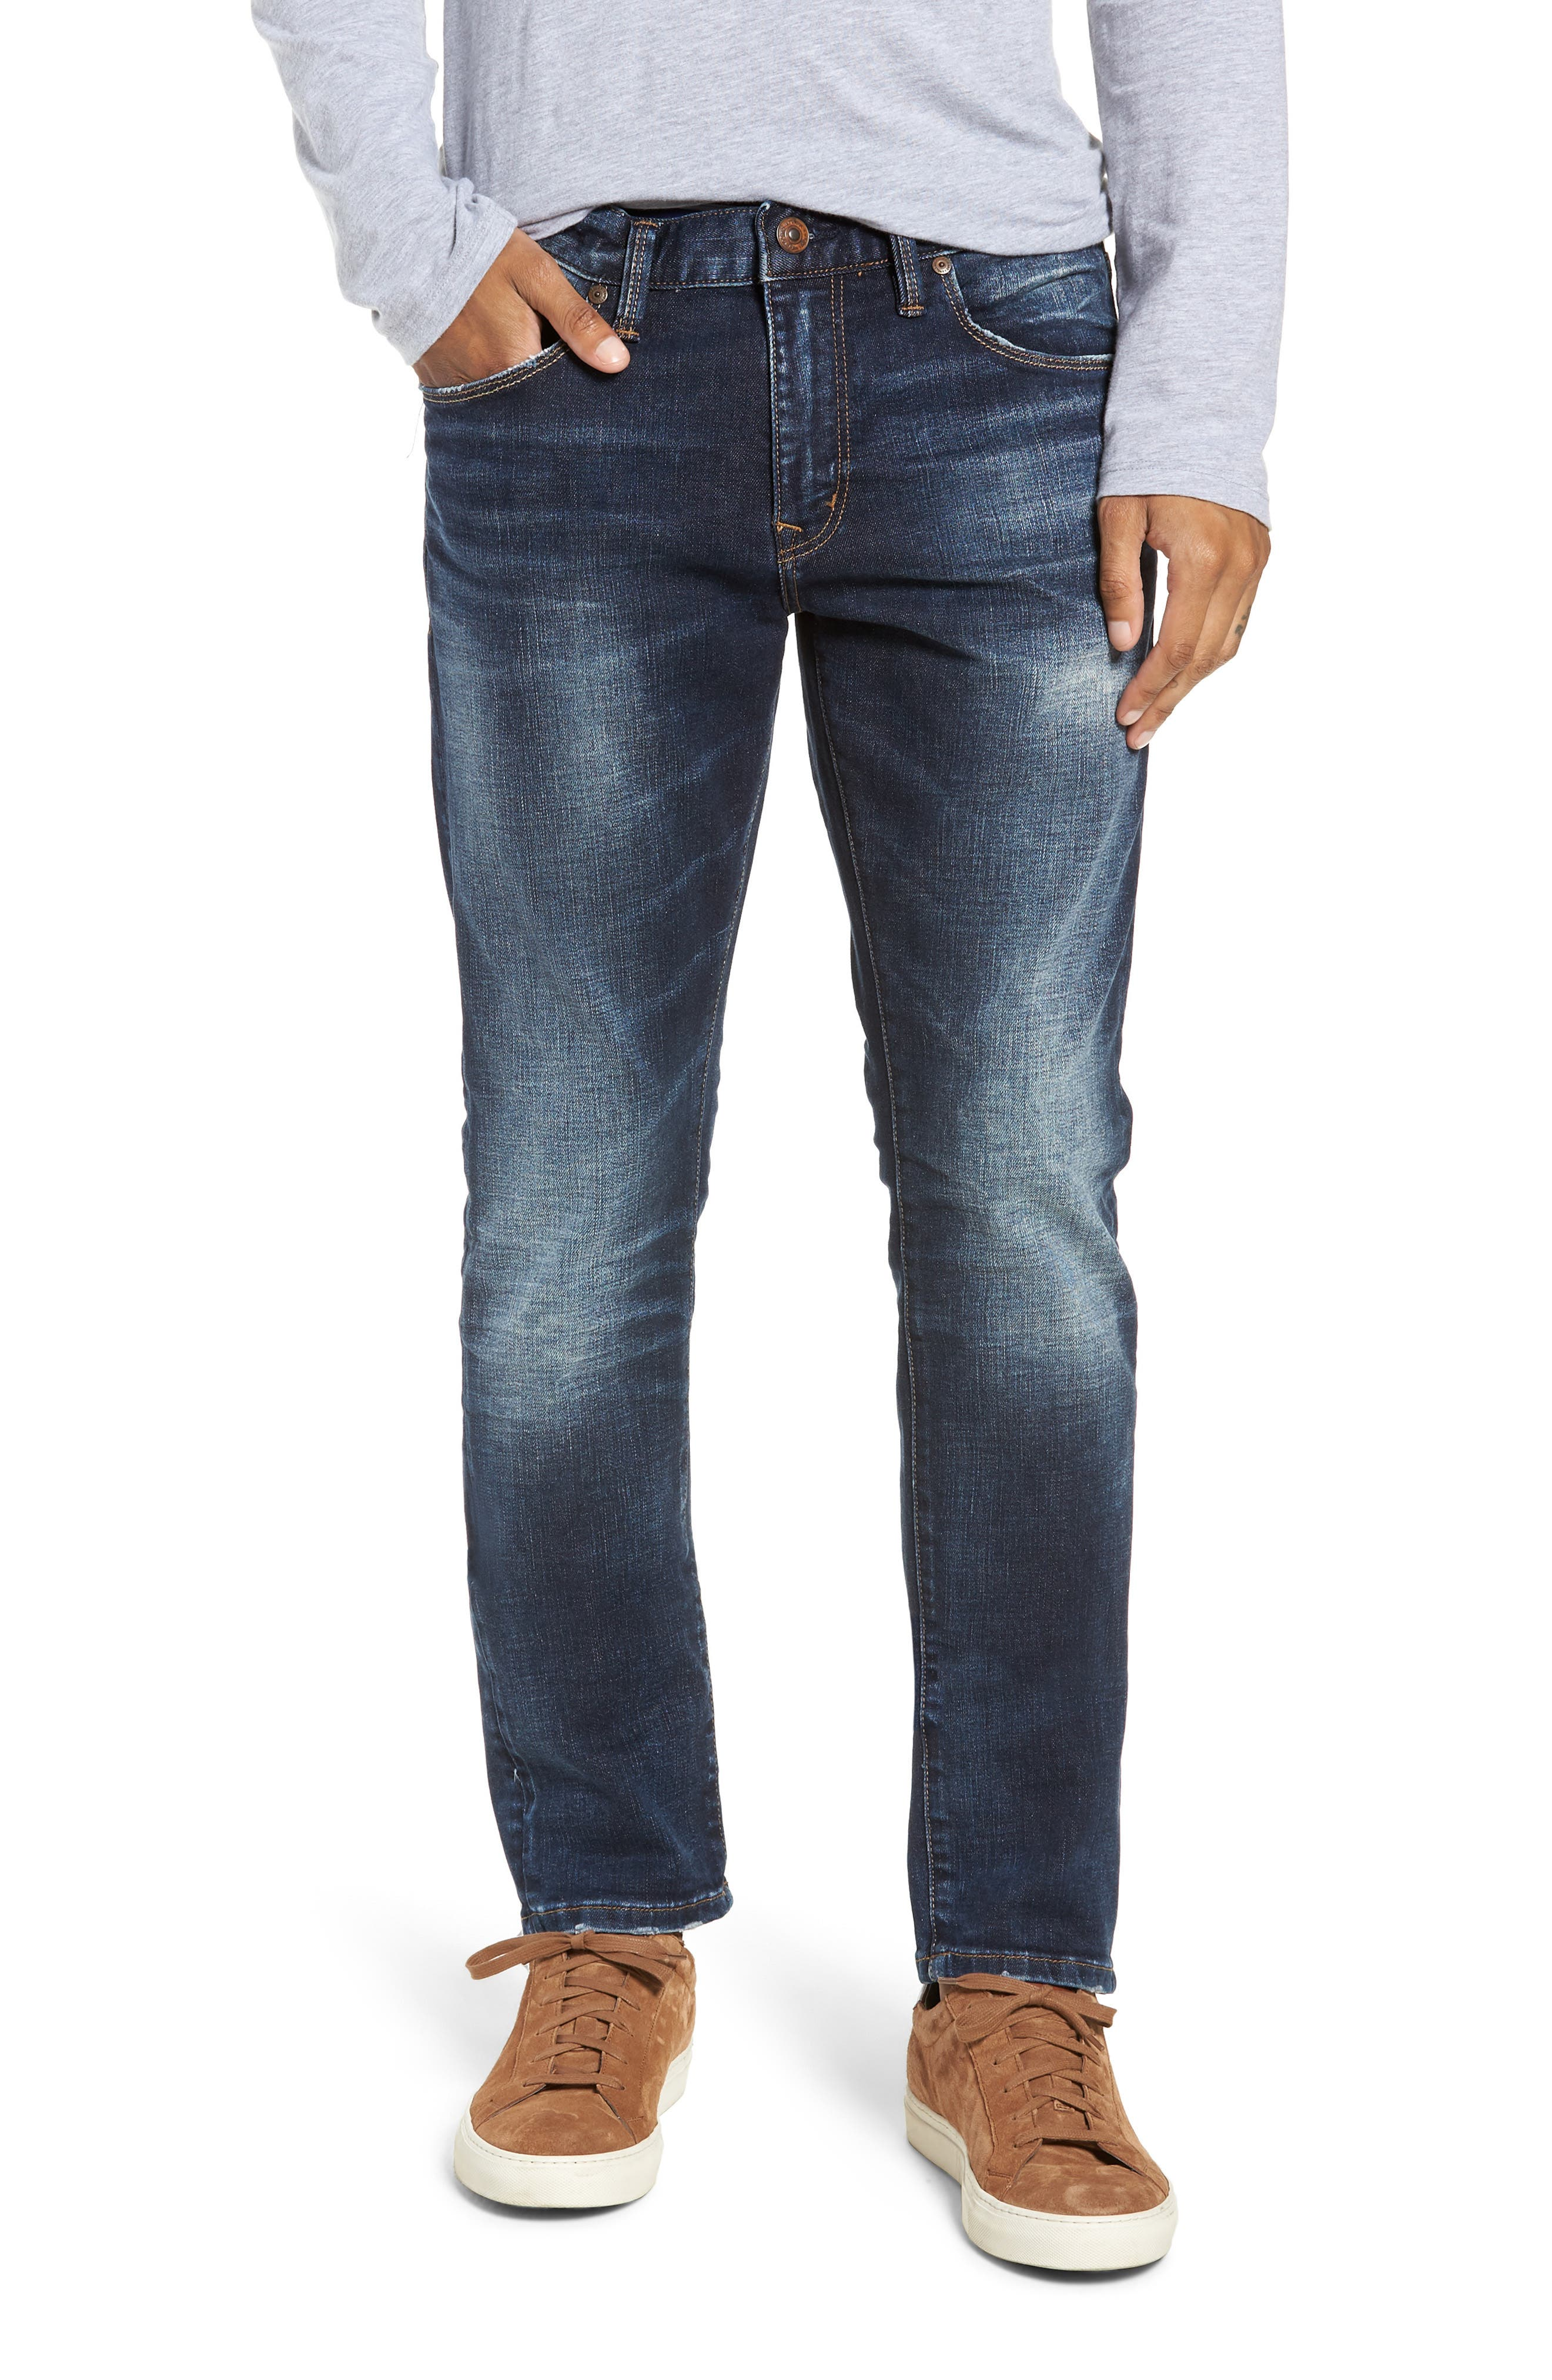 SILVER JEANS CO. Ashdown Slim Straight Fit Jeans, Main, color, INDIGO